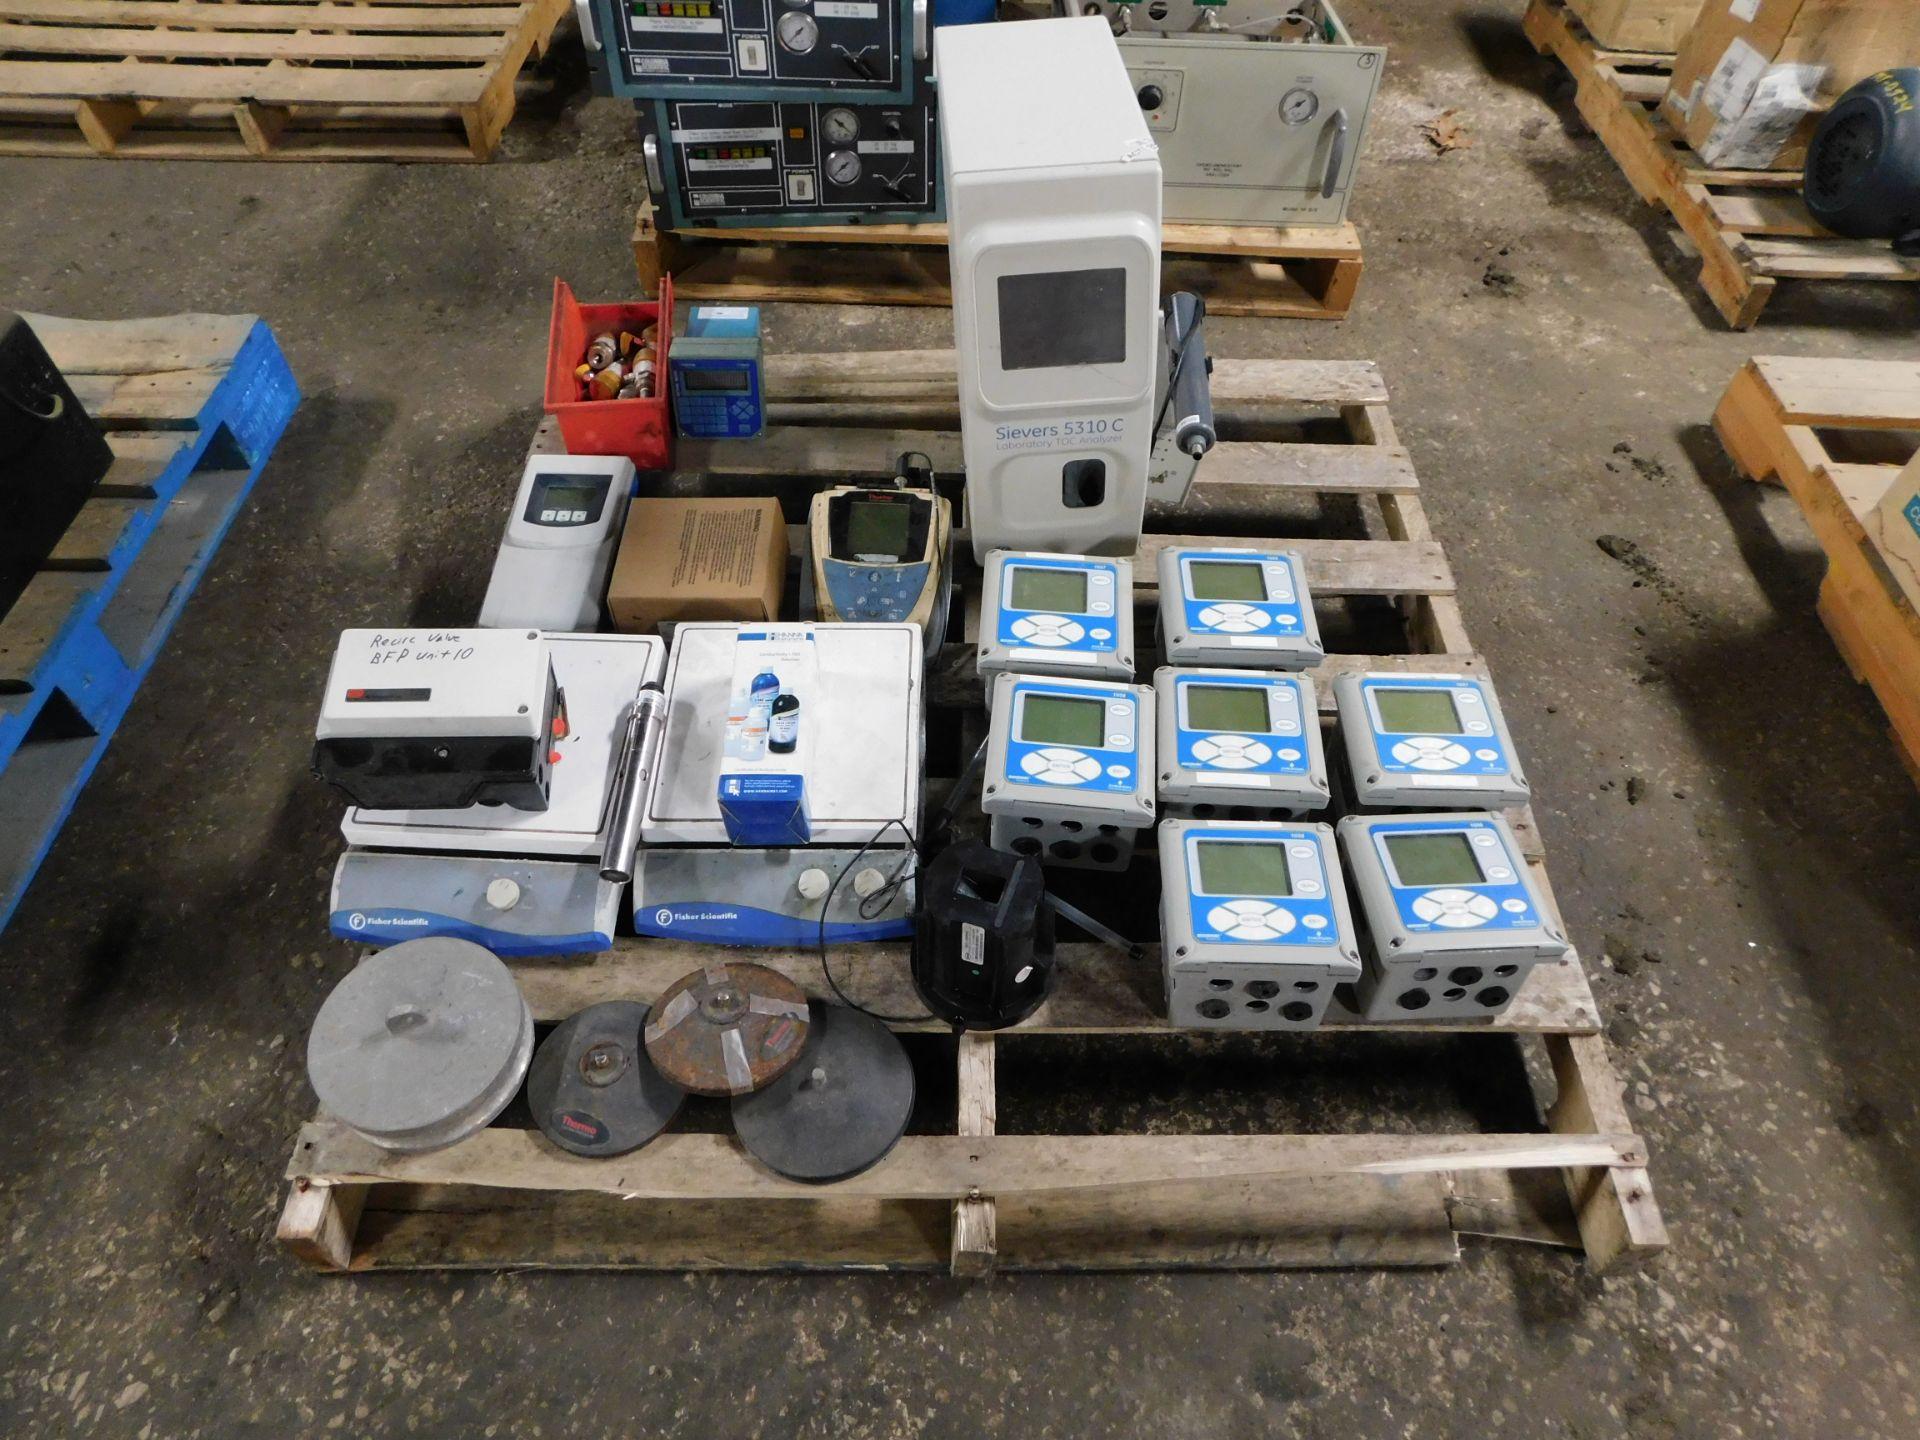 Miscellaneous Lab Equipment, GE Sievers 5310C, 1056/1057 Rosemount, Fisher Scales